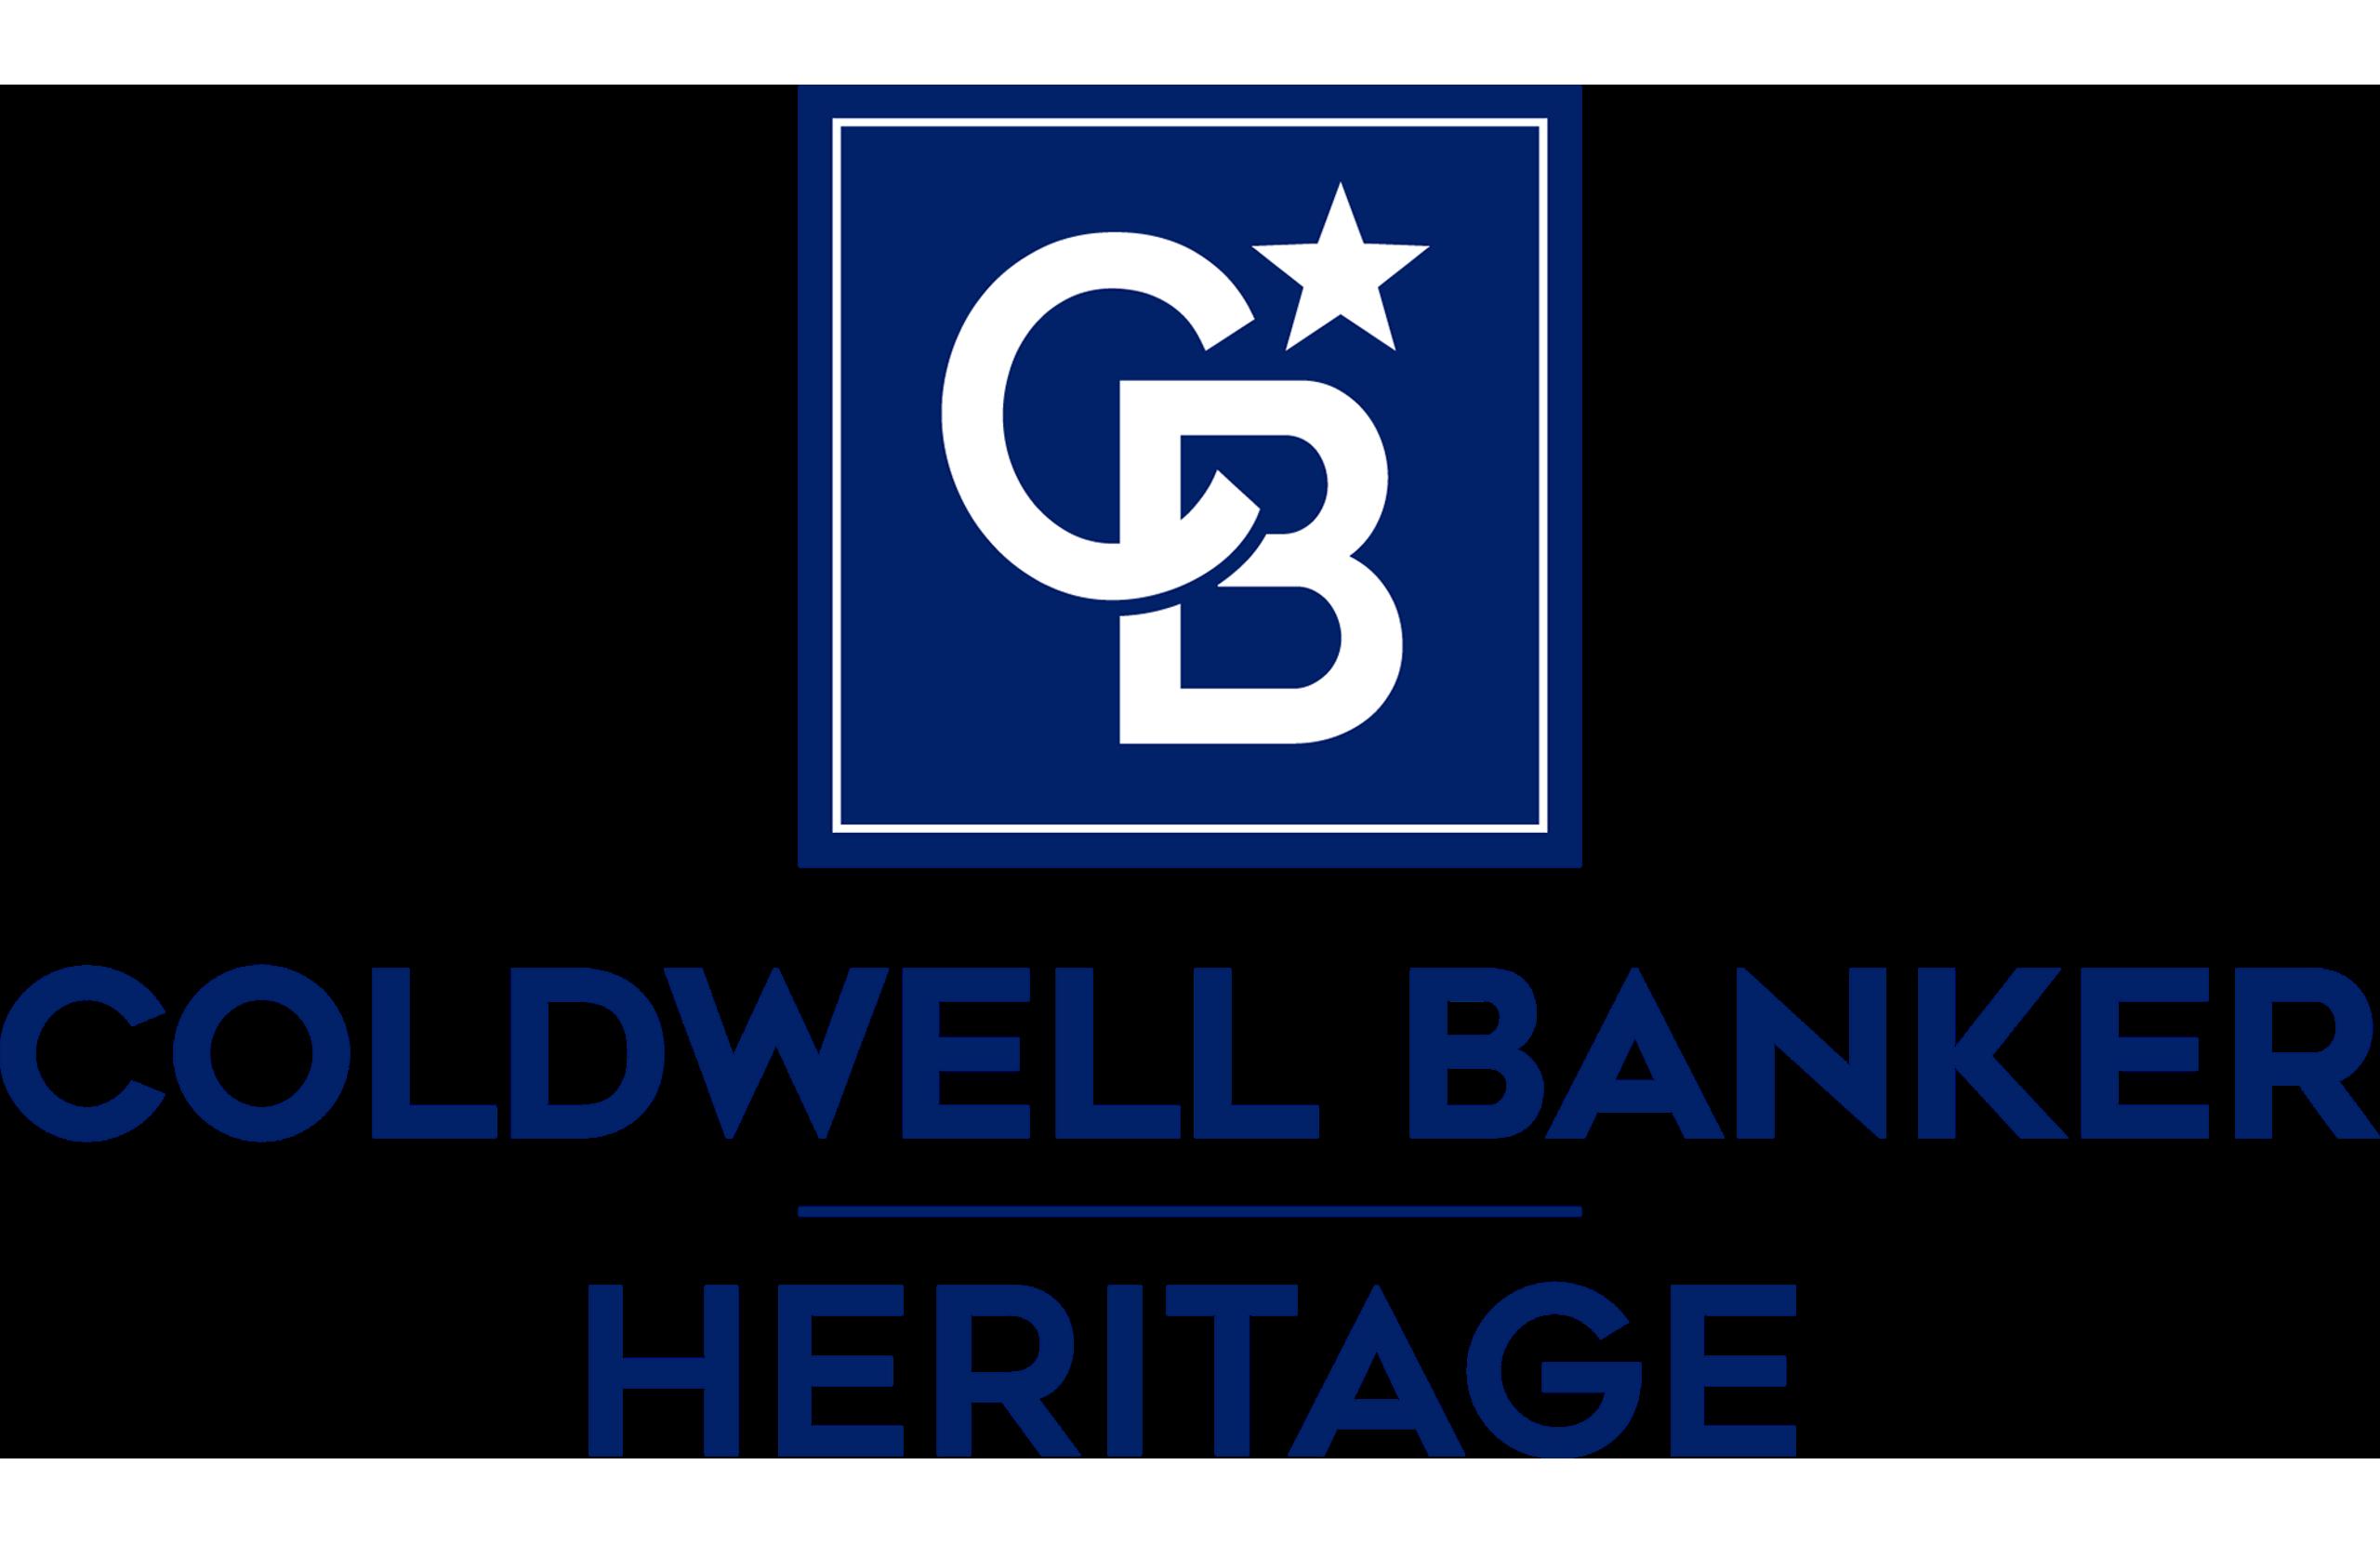 Linda Millhouse - Coldwell Banker Heritage Logo